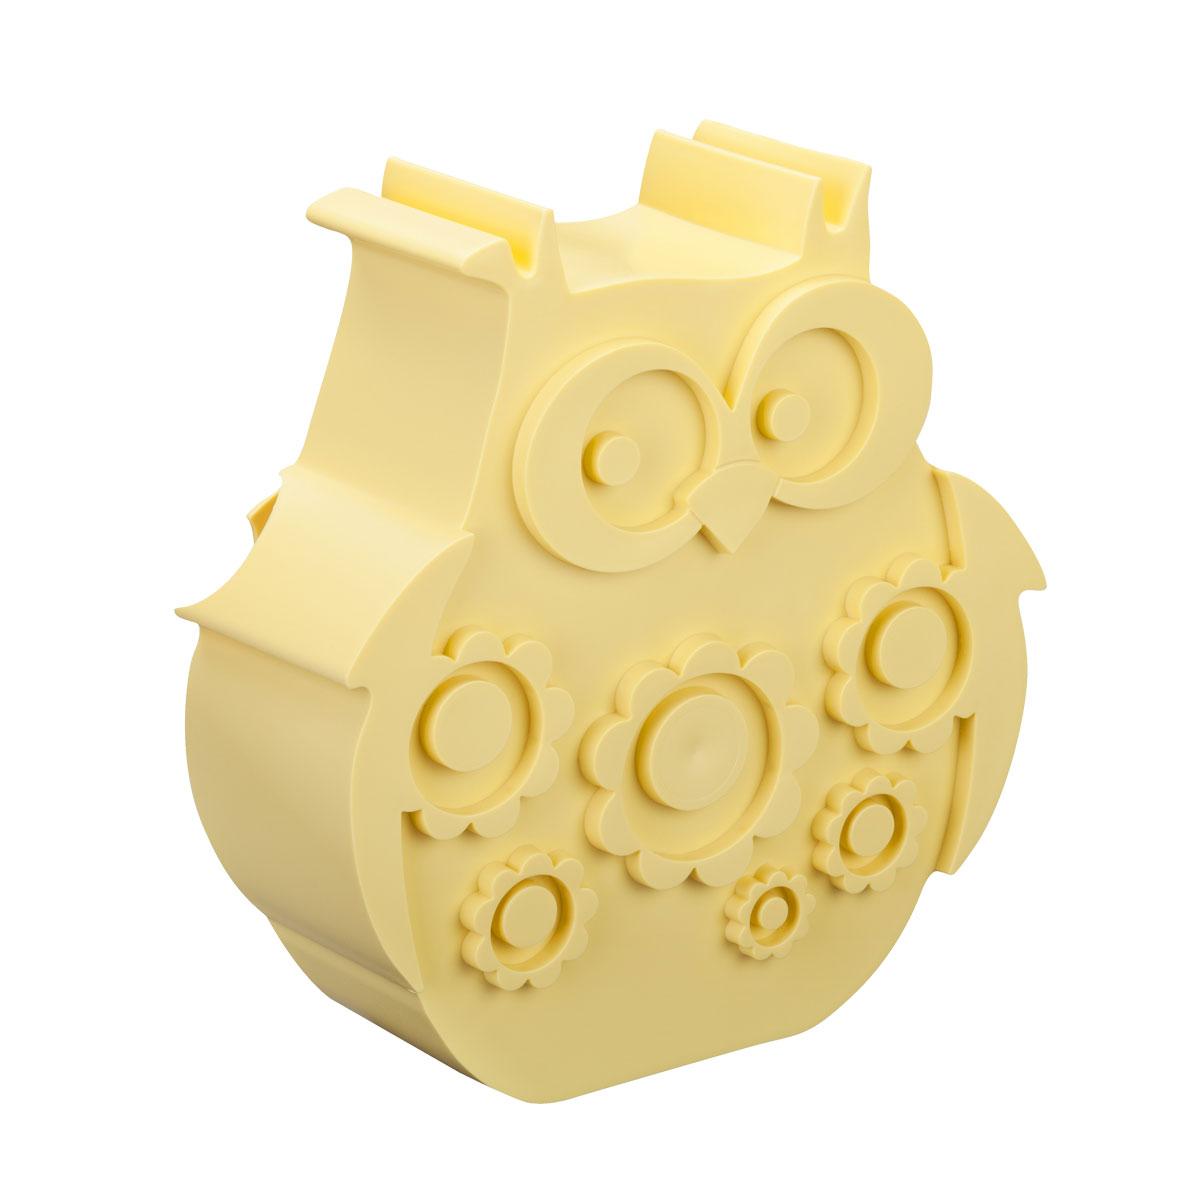 Blafre uglematboks i plast med to rom, gul